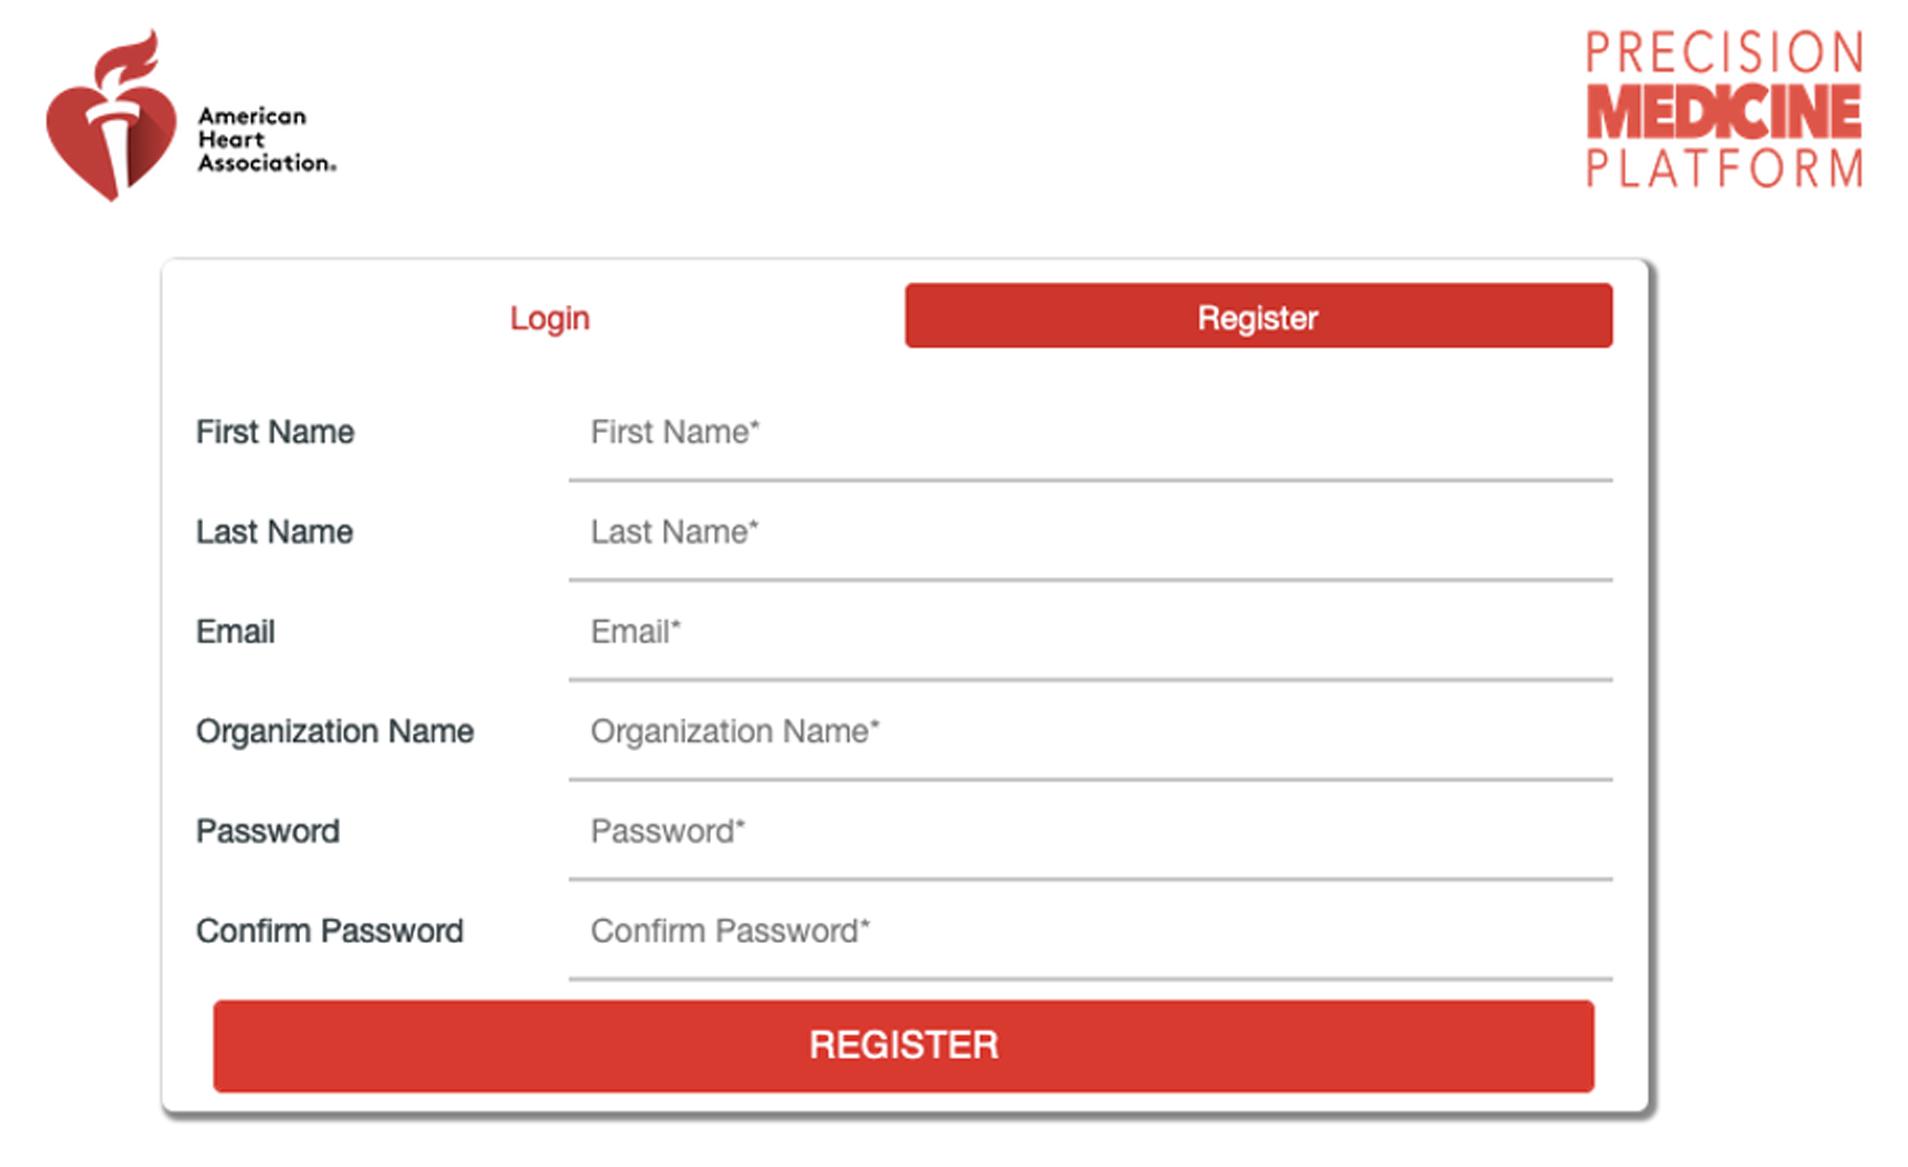 Precision Medicine Platform - Registration